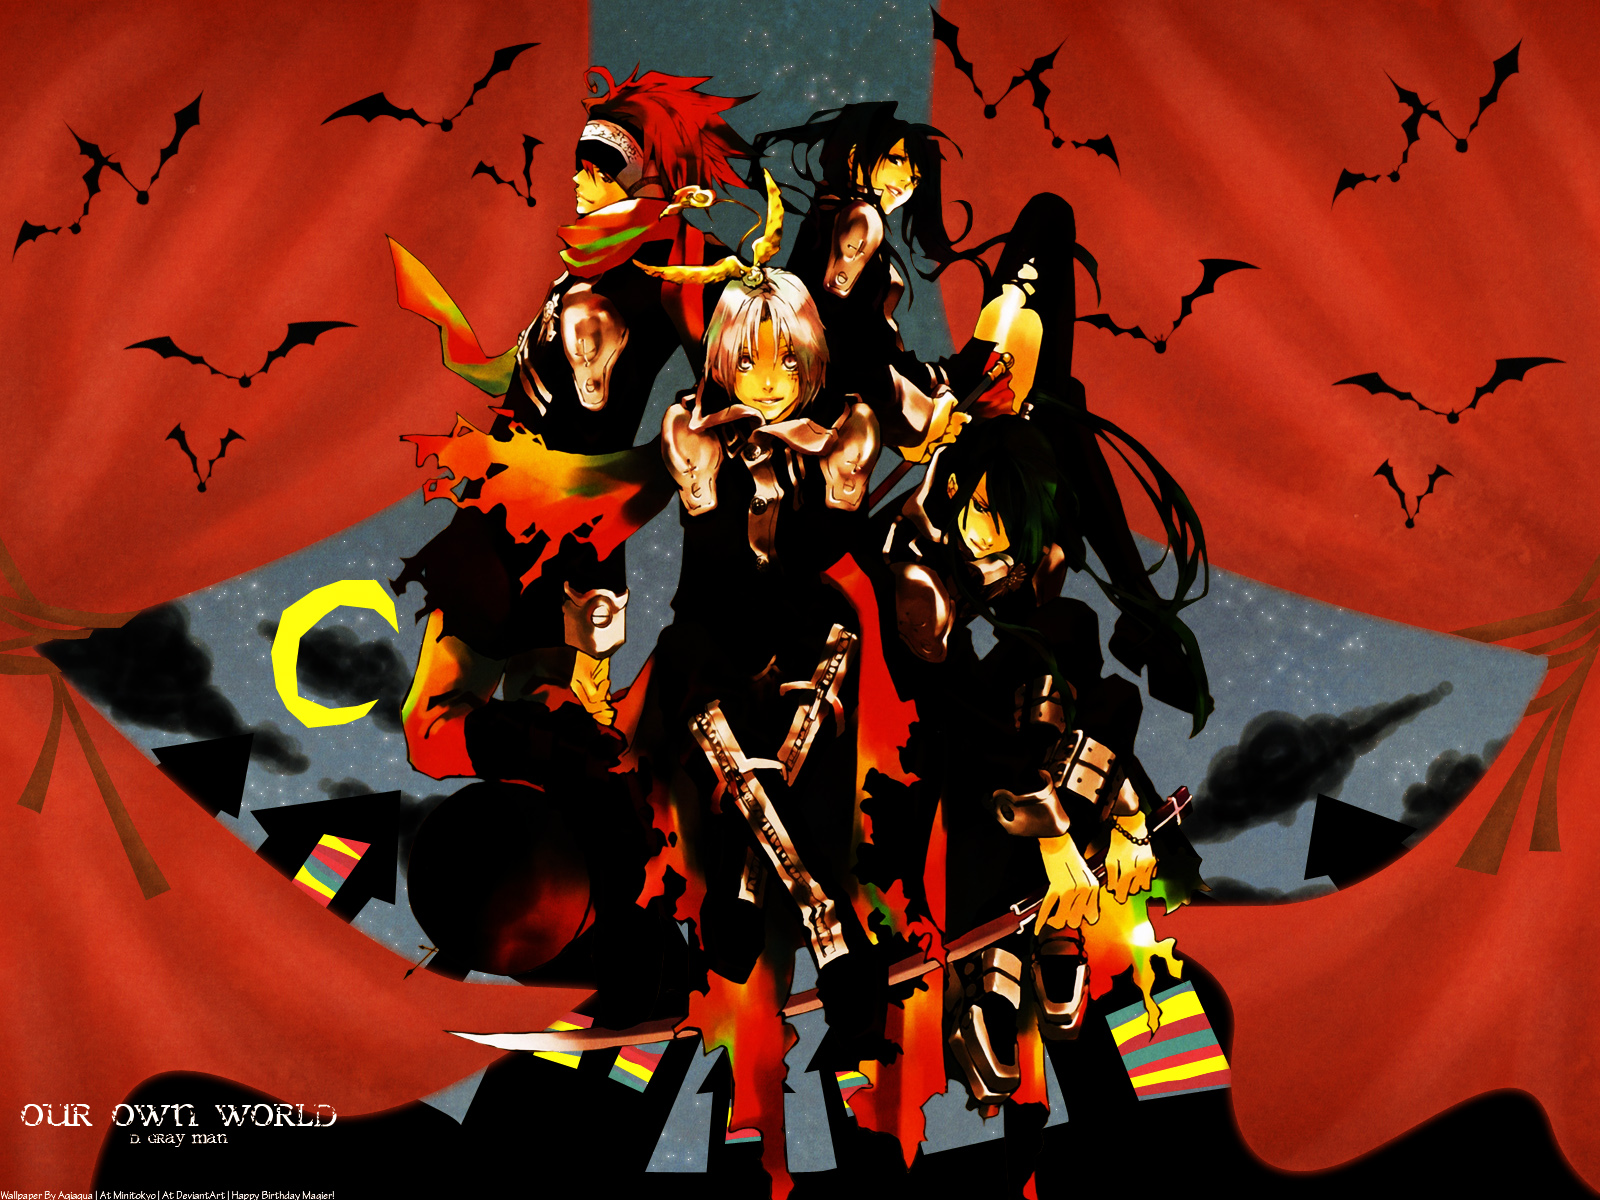 http://1.bp.blogspot.com/-FcrN2UiH2hc/T5xhkhxpk5I/AAAAAAAAAX0/yXAcSm7Q57w/s1600/Konachan.com+-+53044+allen_walker+d.gray-man+kanda_yuu+lavi+lenalee_lee.jpg